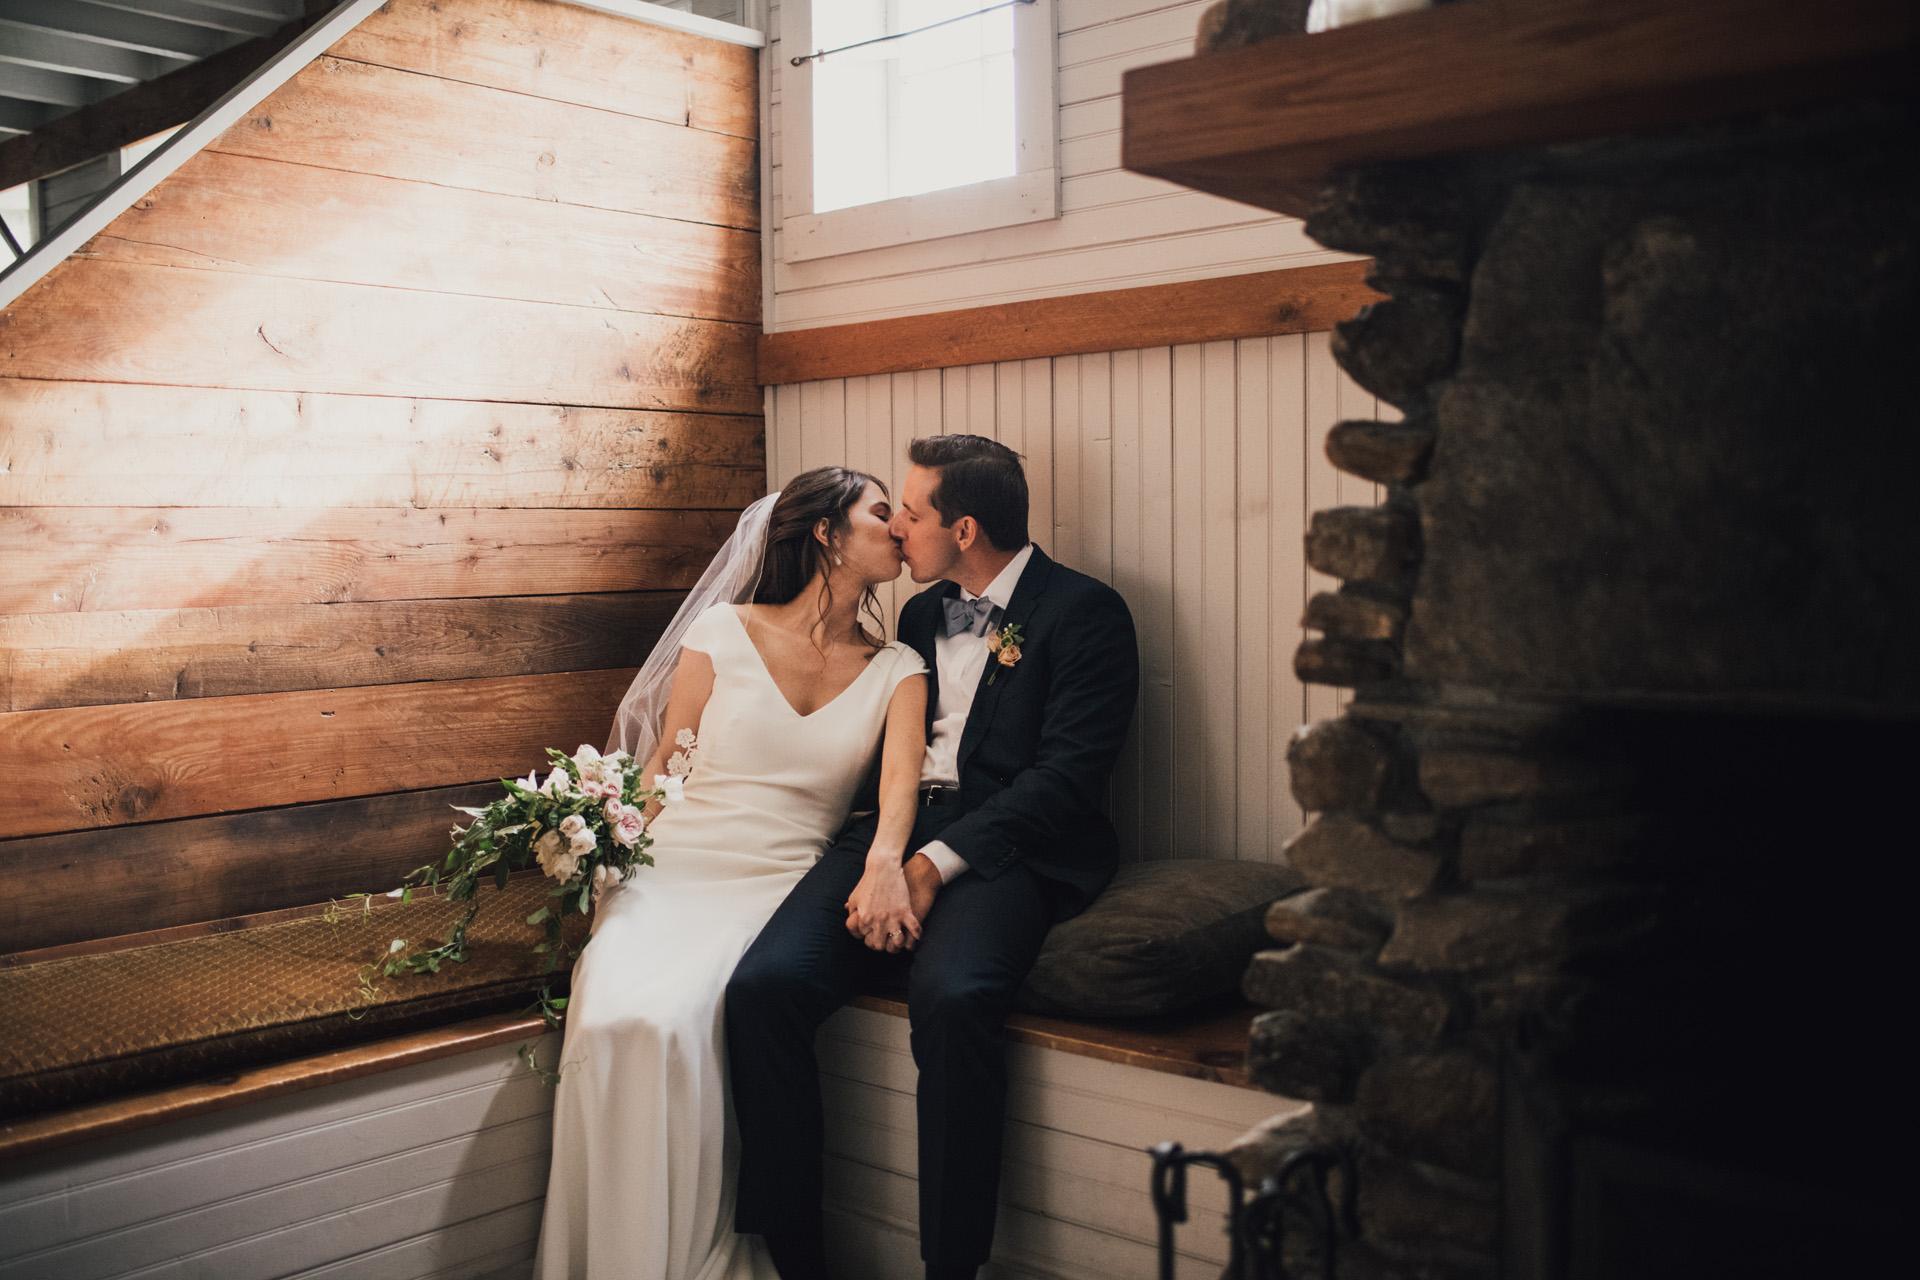 gedney-farm-wedding-photographer-43